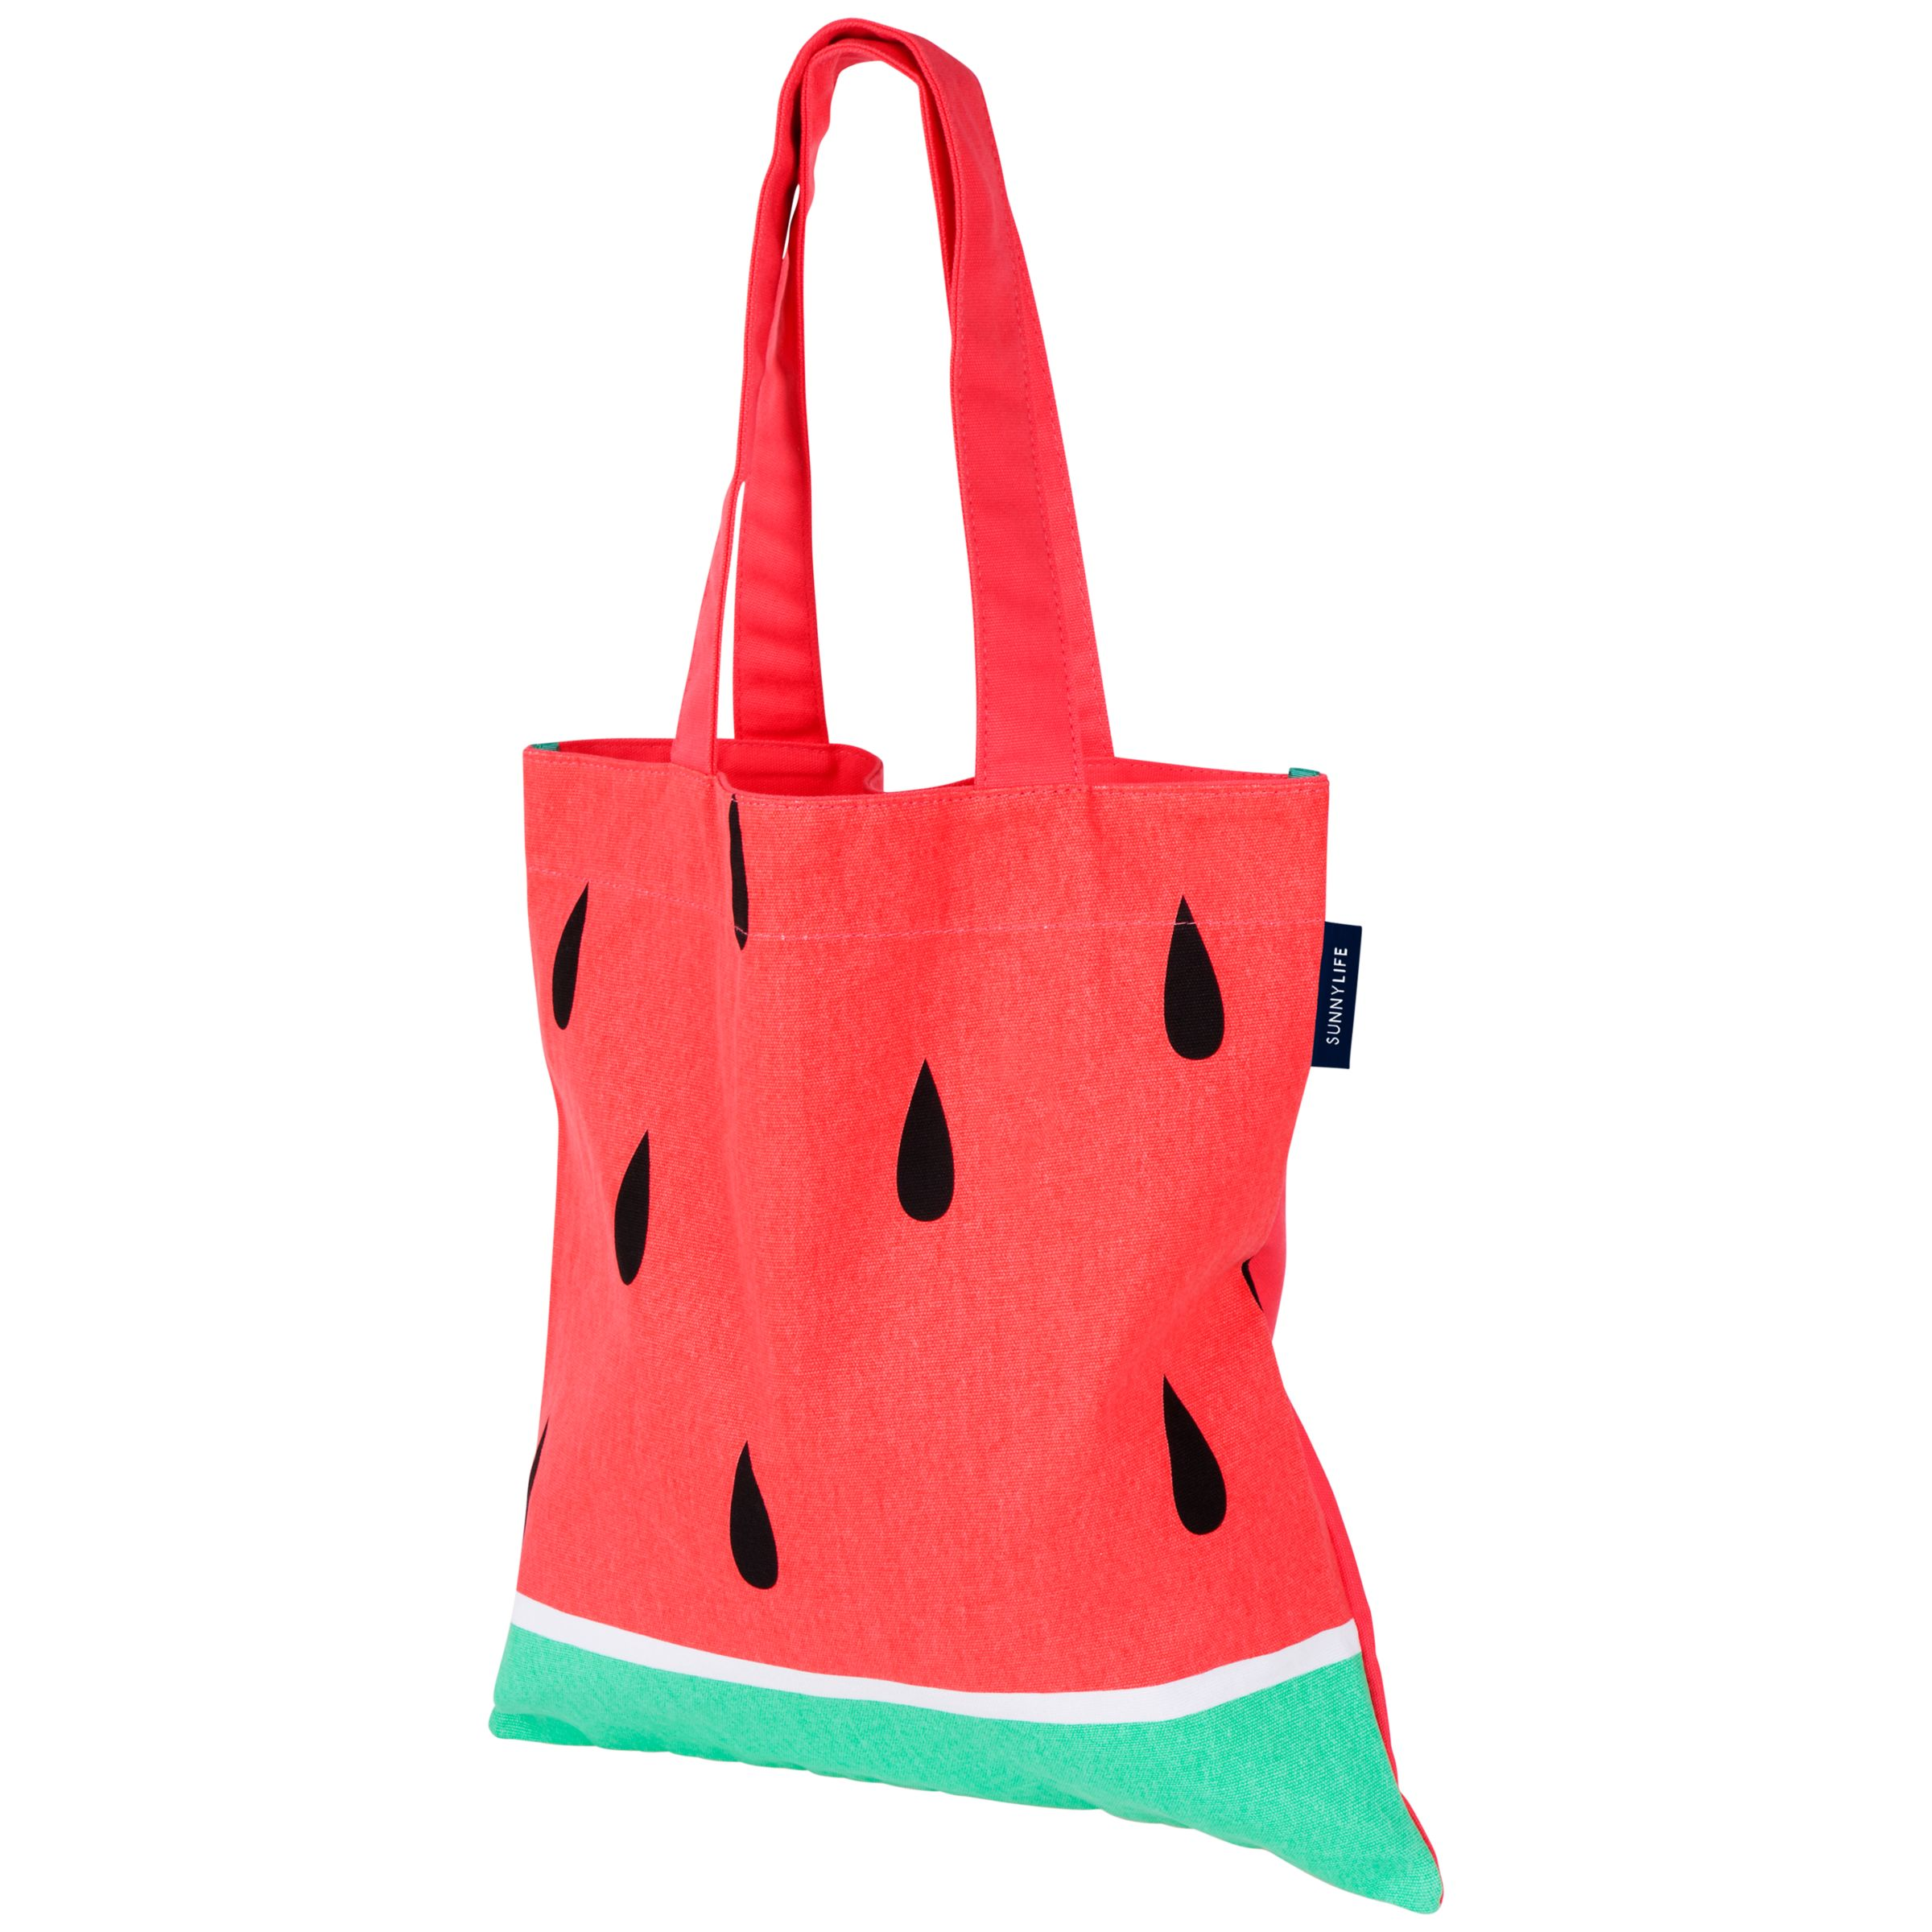 Sunnylife Sunnylife Watermelon Tote Bag